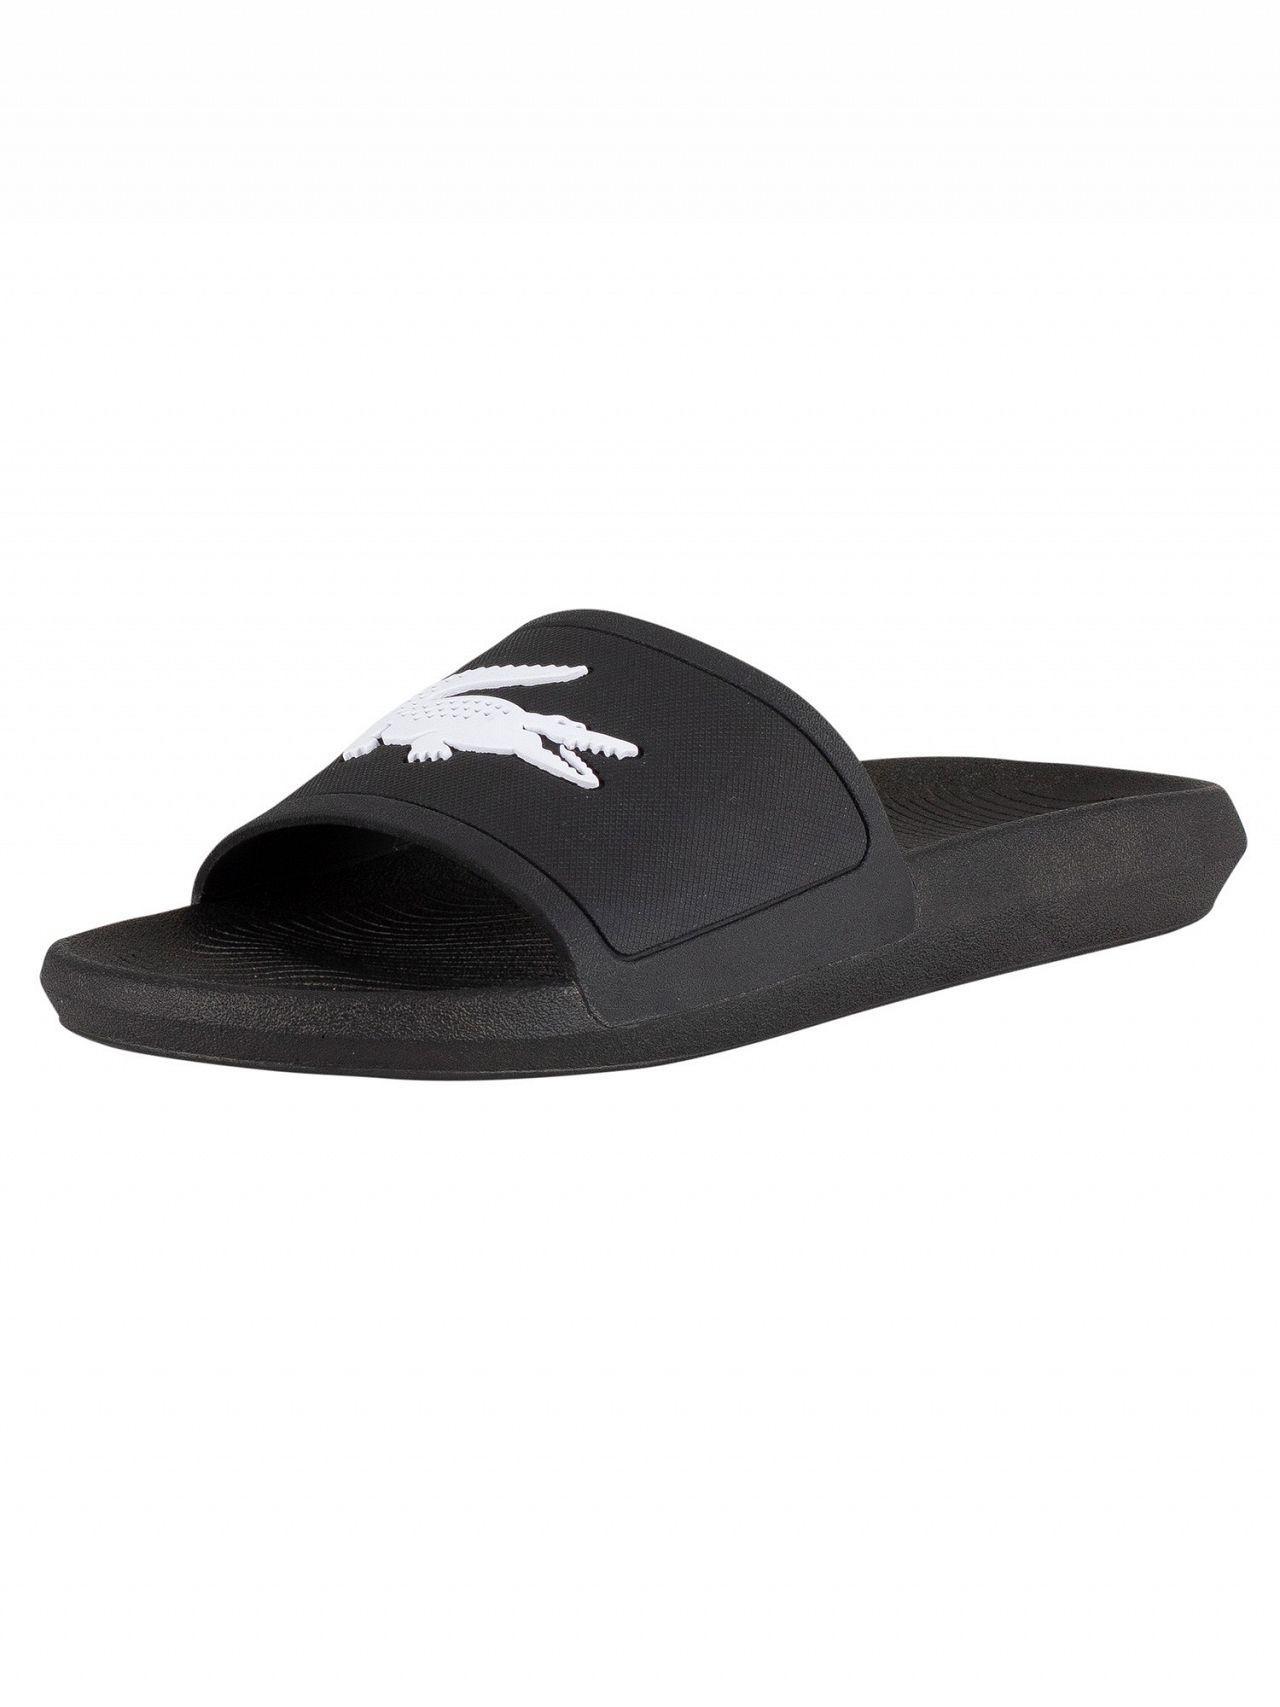 252efb3b4 Lacoste Black white Croco 119 1 Cma Sliders in Black for Men - Save ...